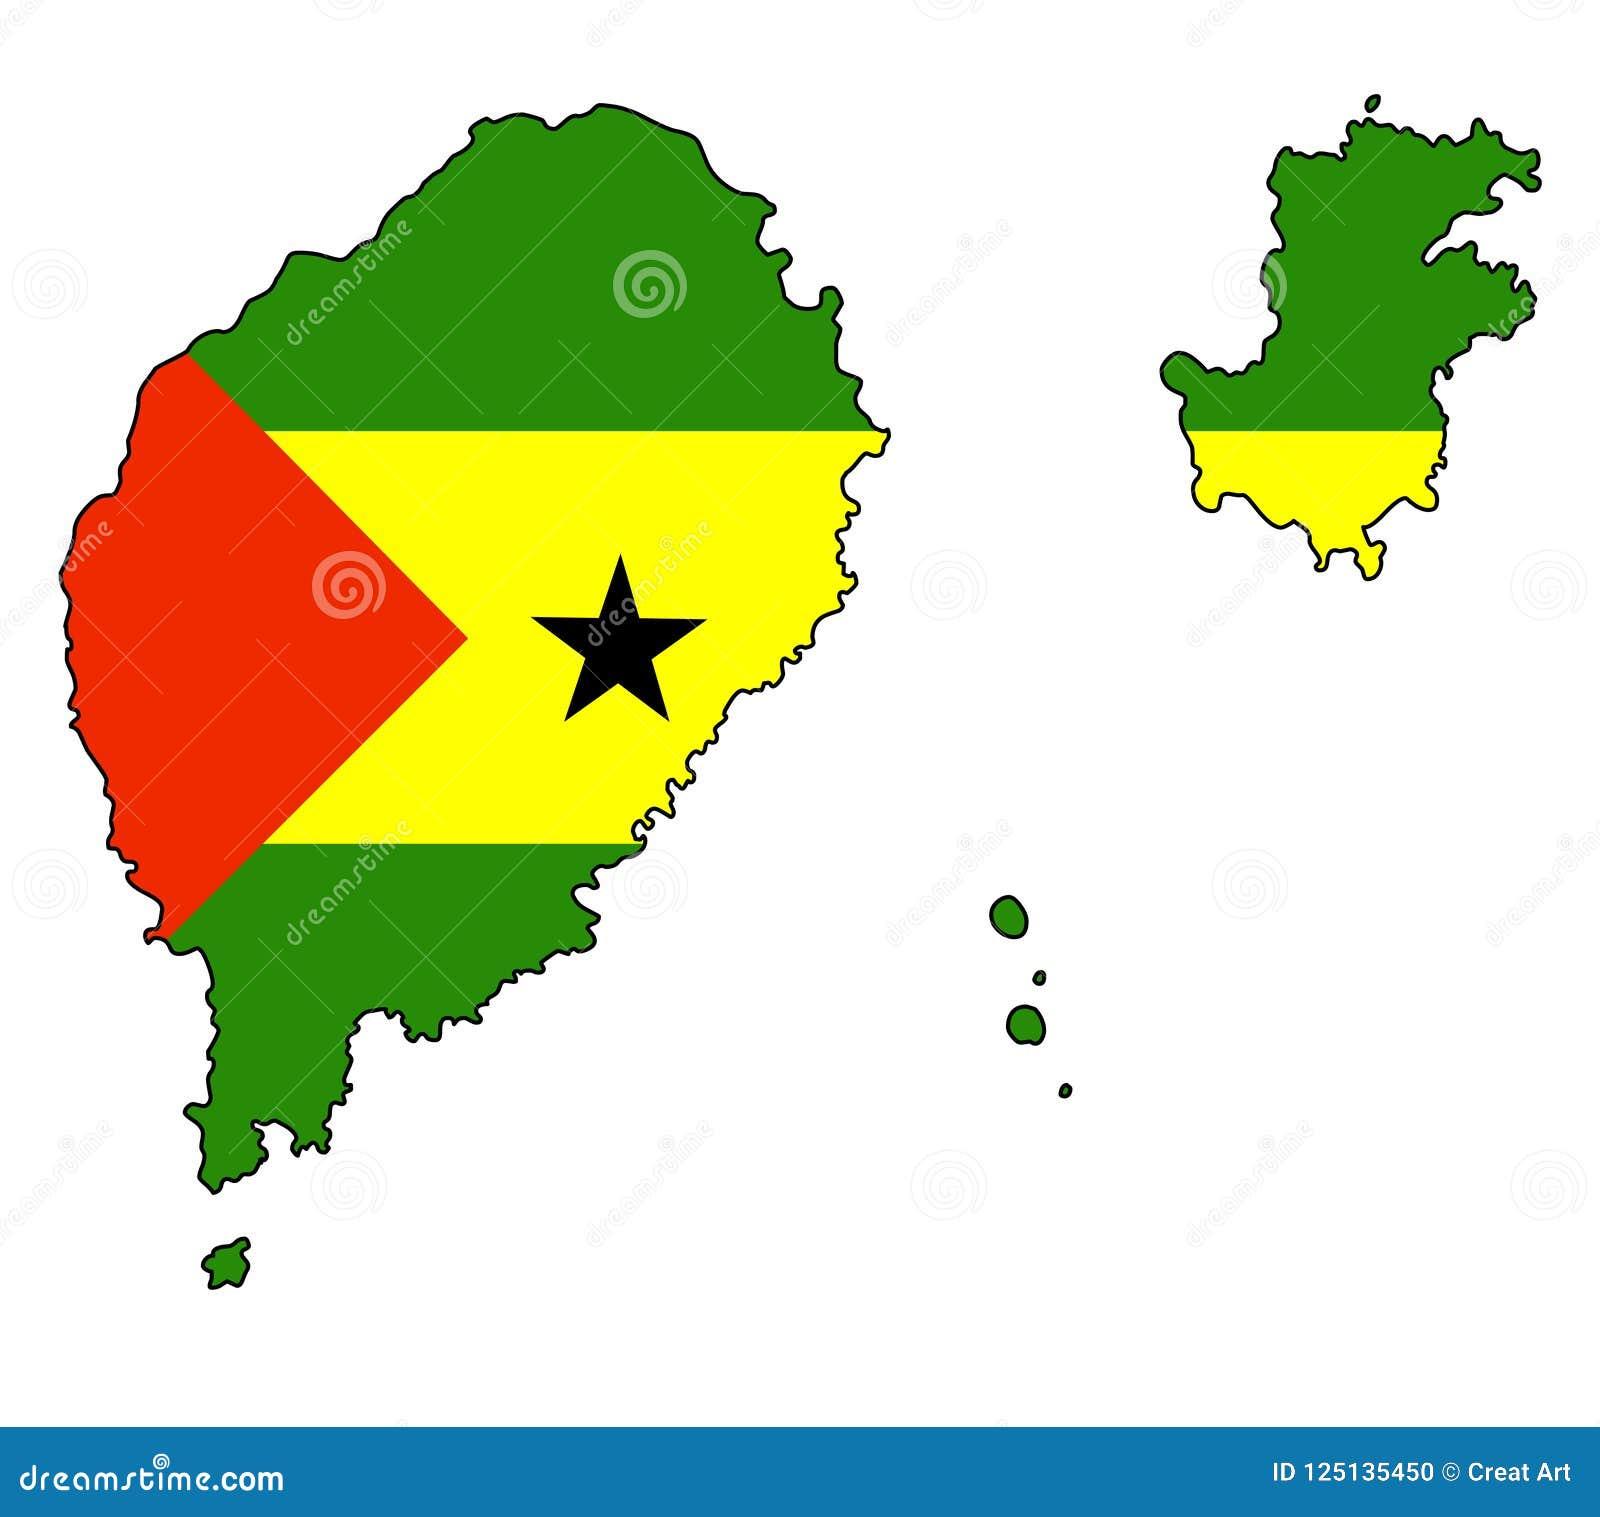 Sao Tome And Principe Map Of Sao Tome And Principe Vector Illus